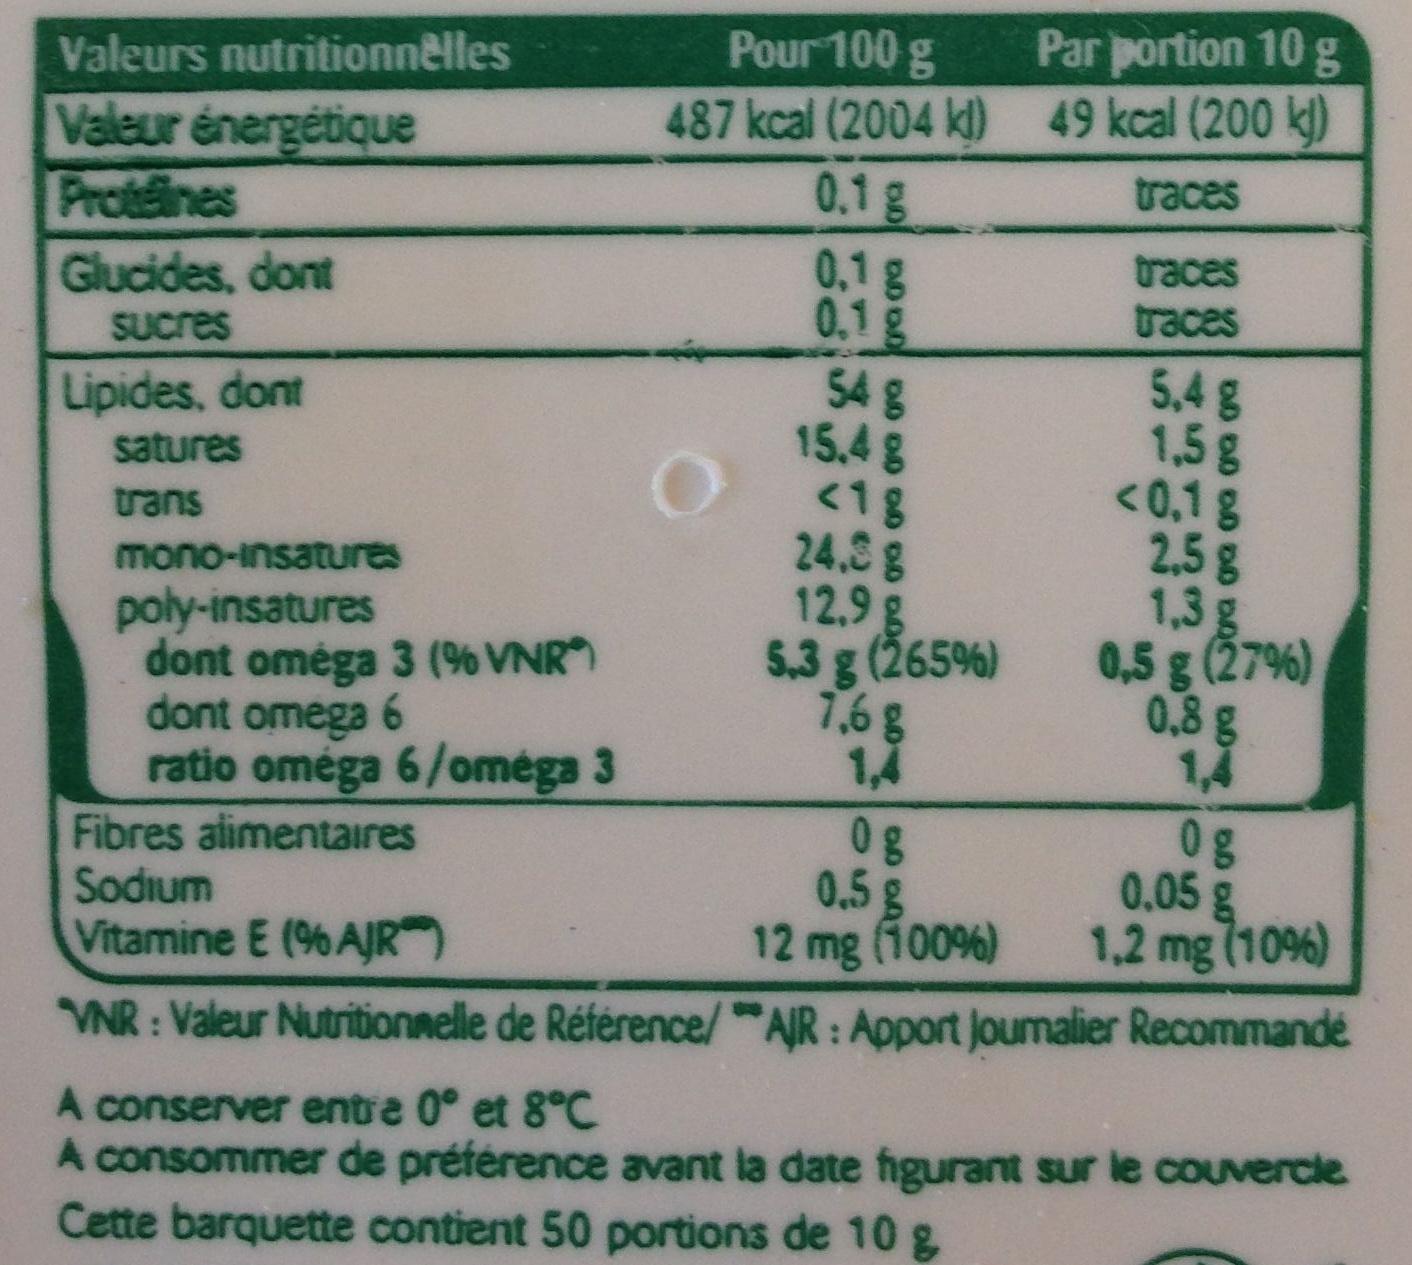 Oméga 3 sel de mer, Tartine et Cuisson - Informations nutritionnelles - fr